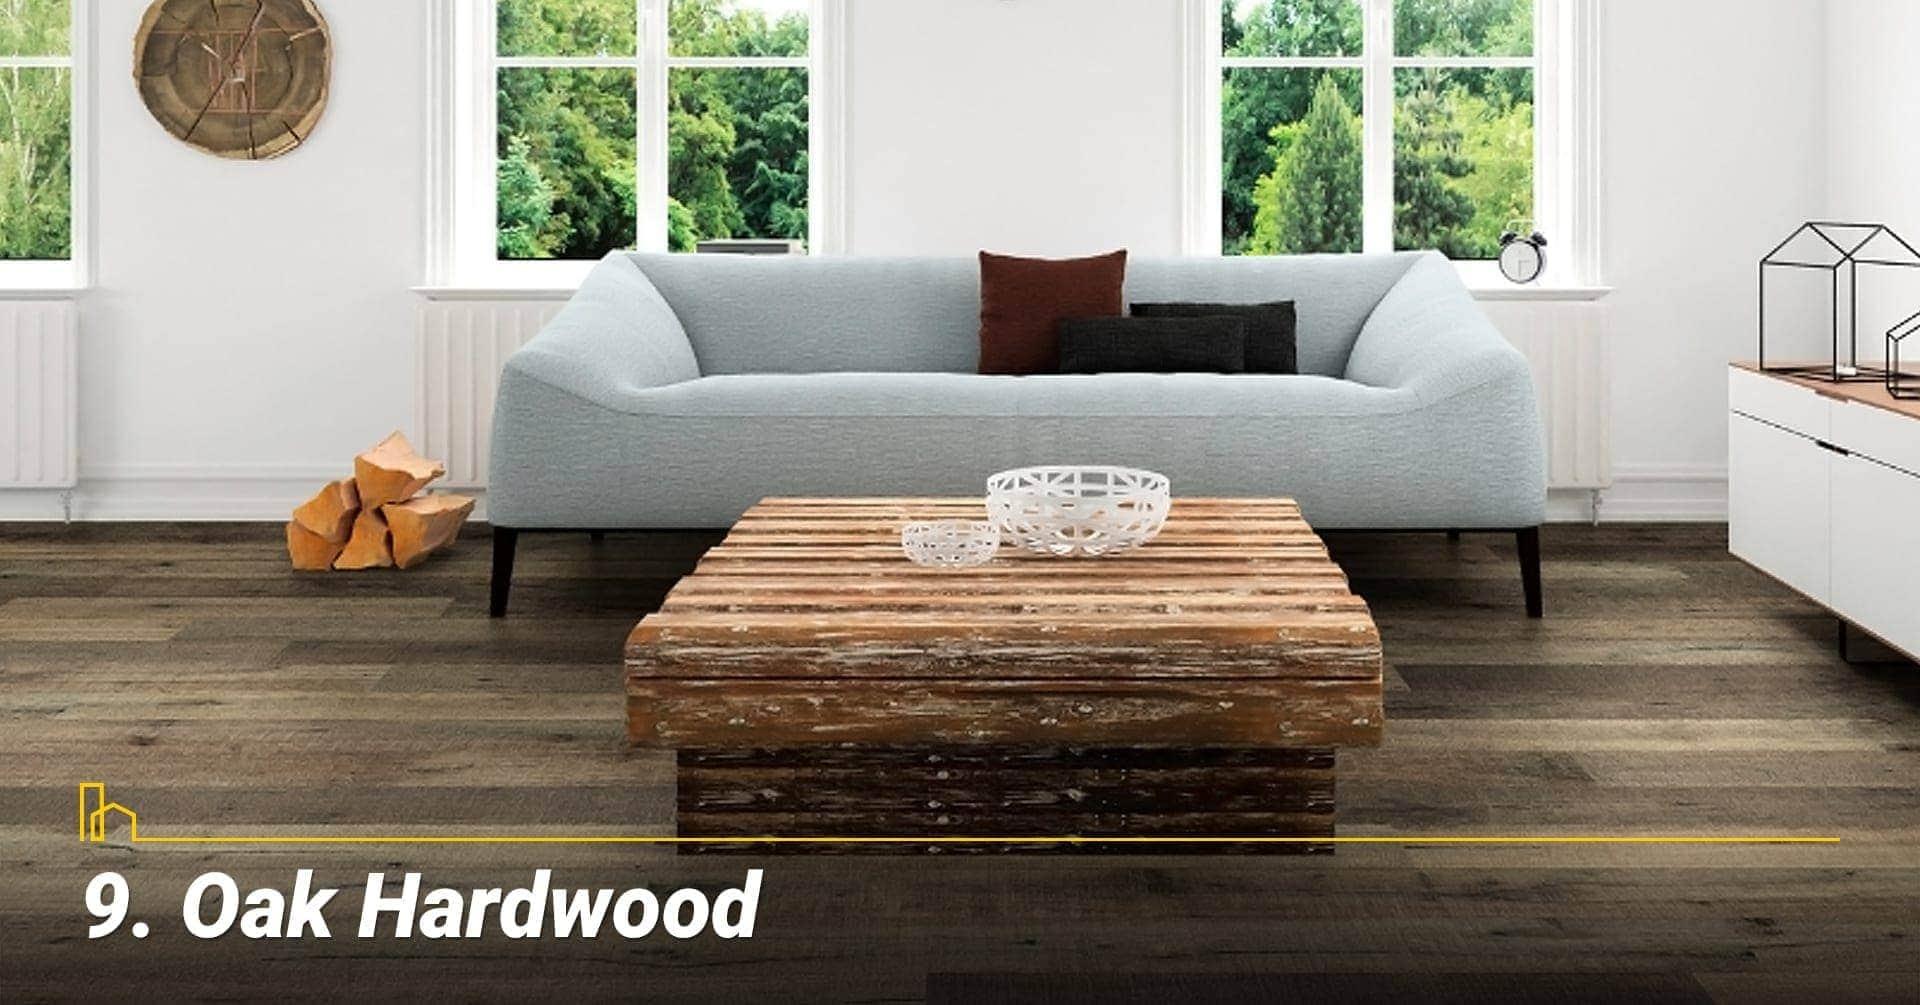 Oak Hardwood, cover your floor with oak hardwood